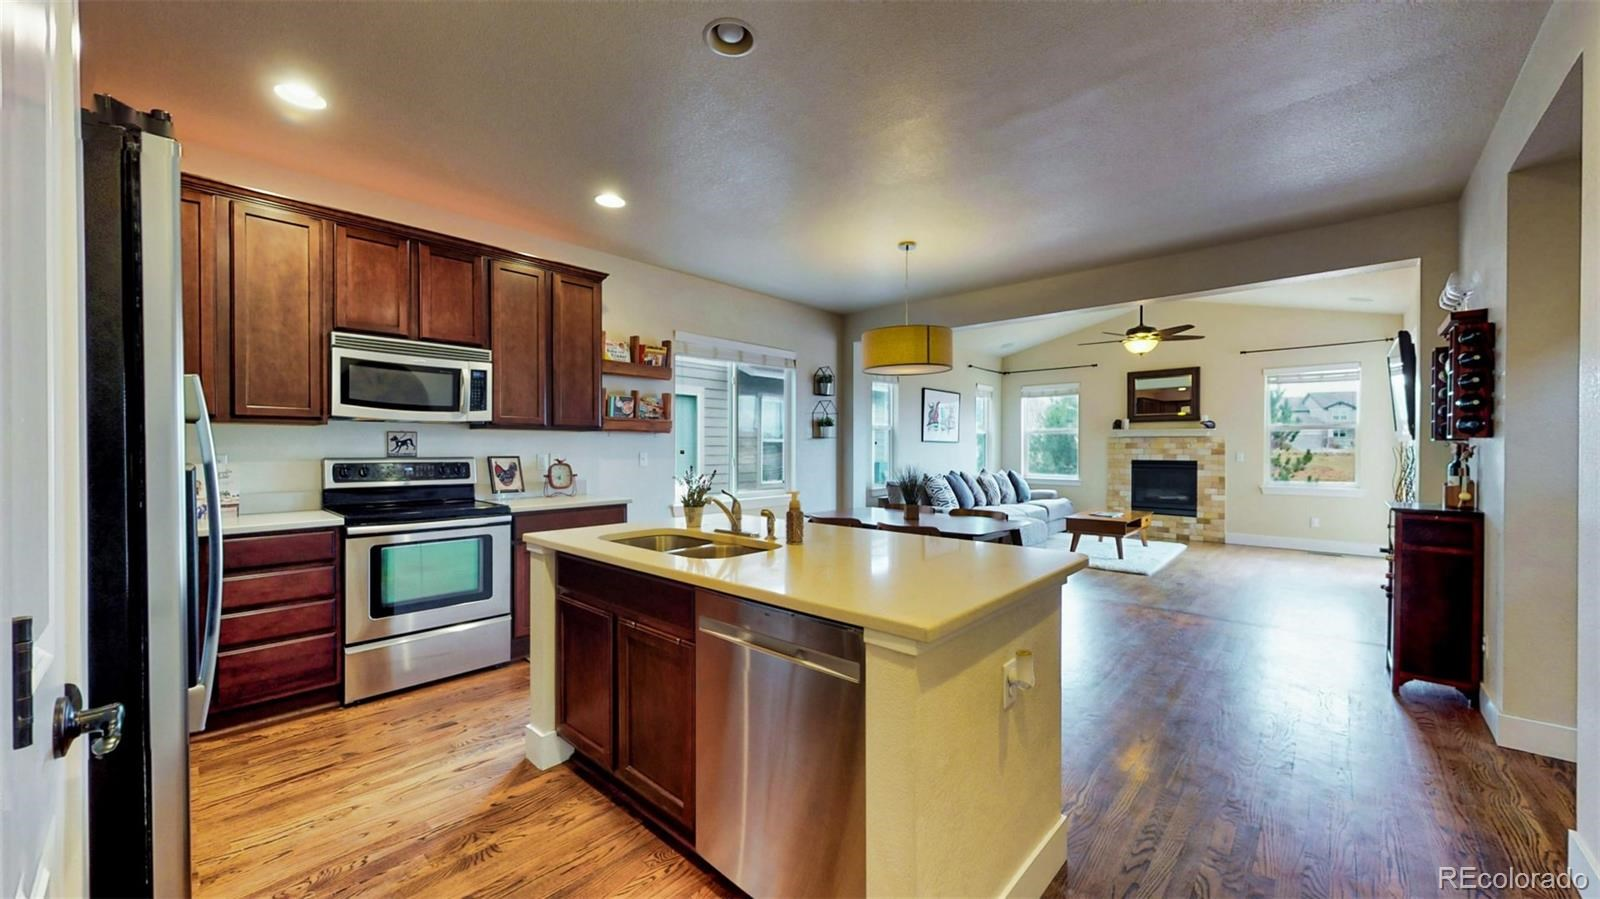 MLS# 8268568 - 4 - 10593 Rutledge Street, Parker, CO 80134